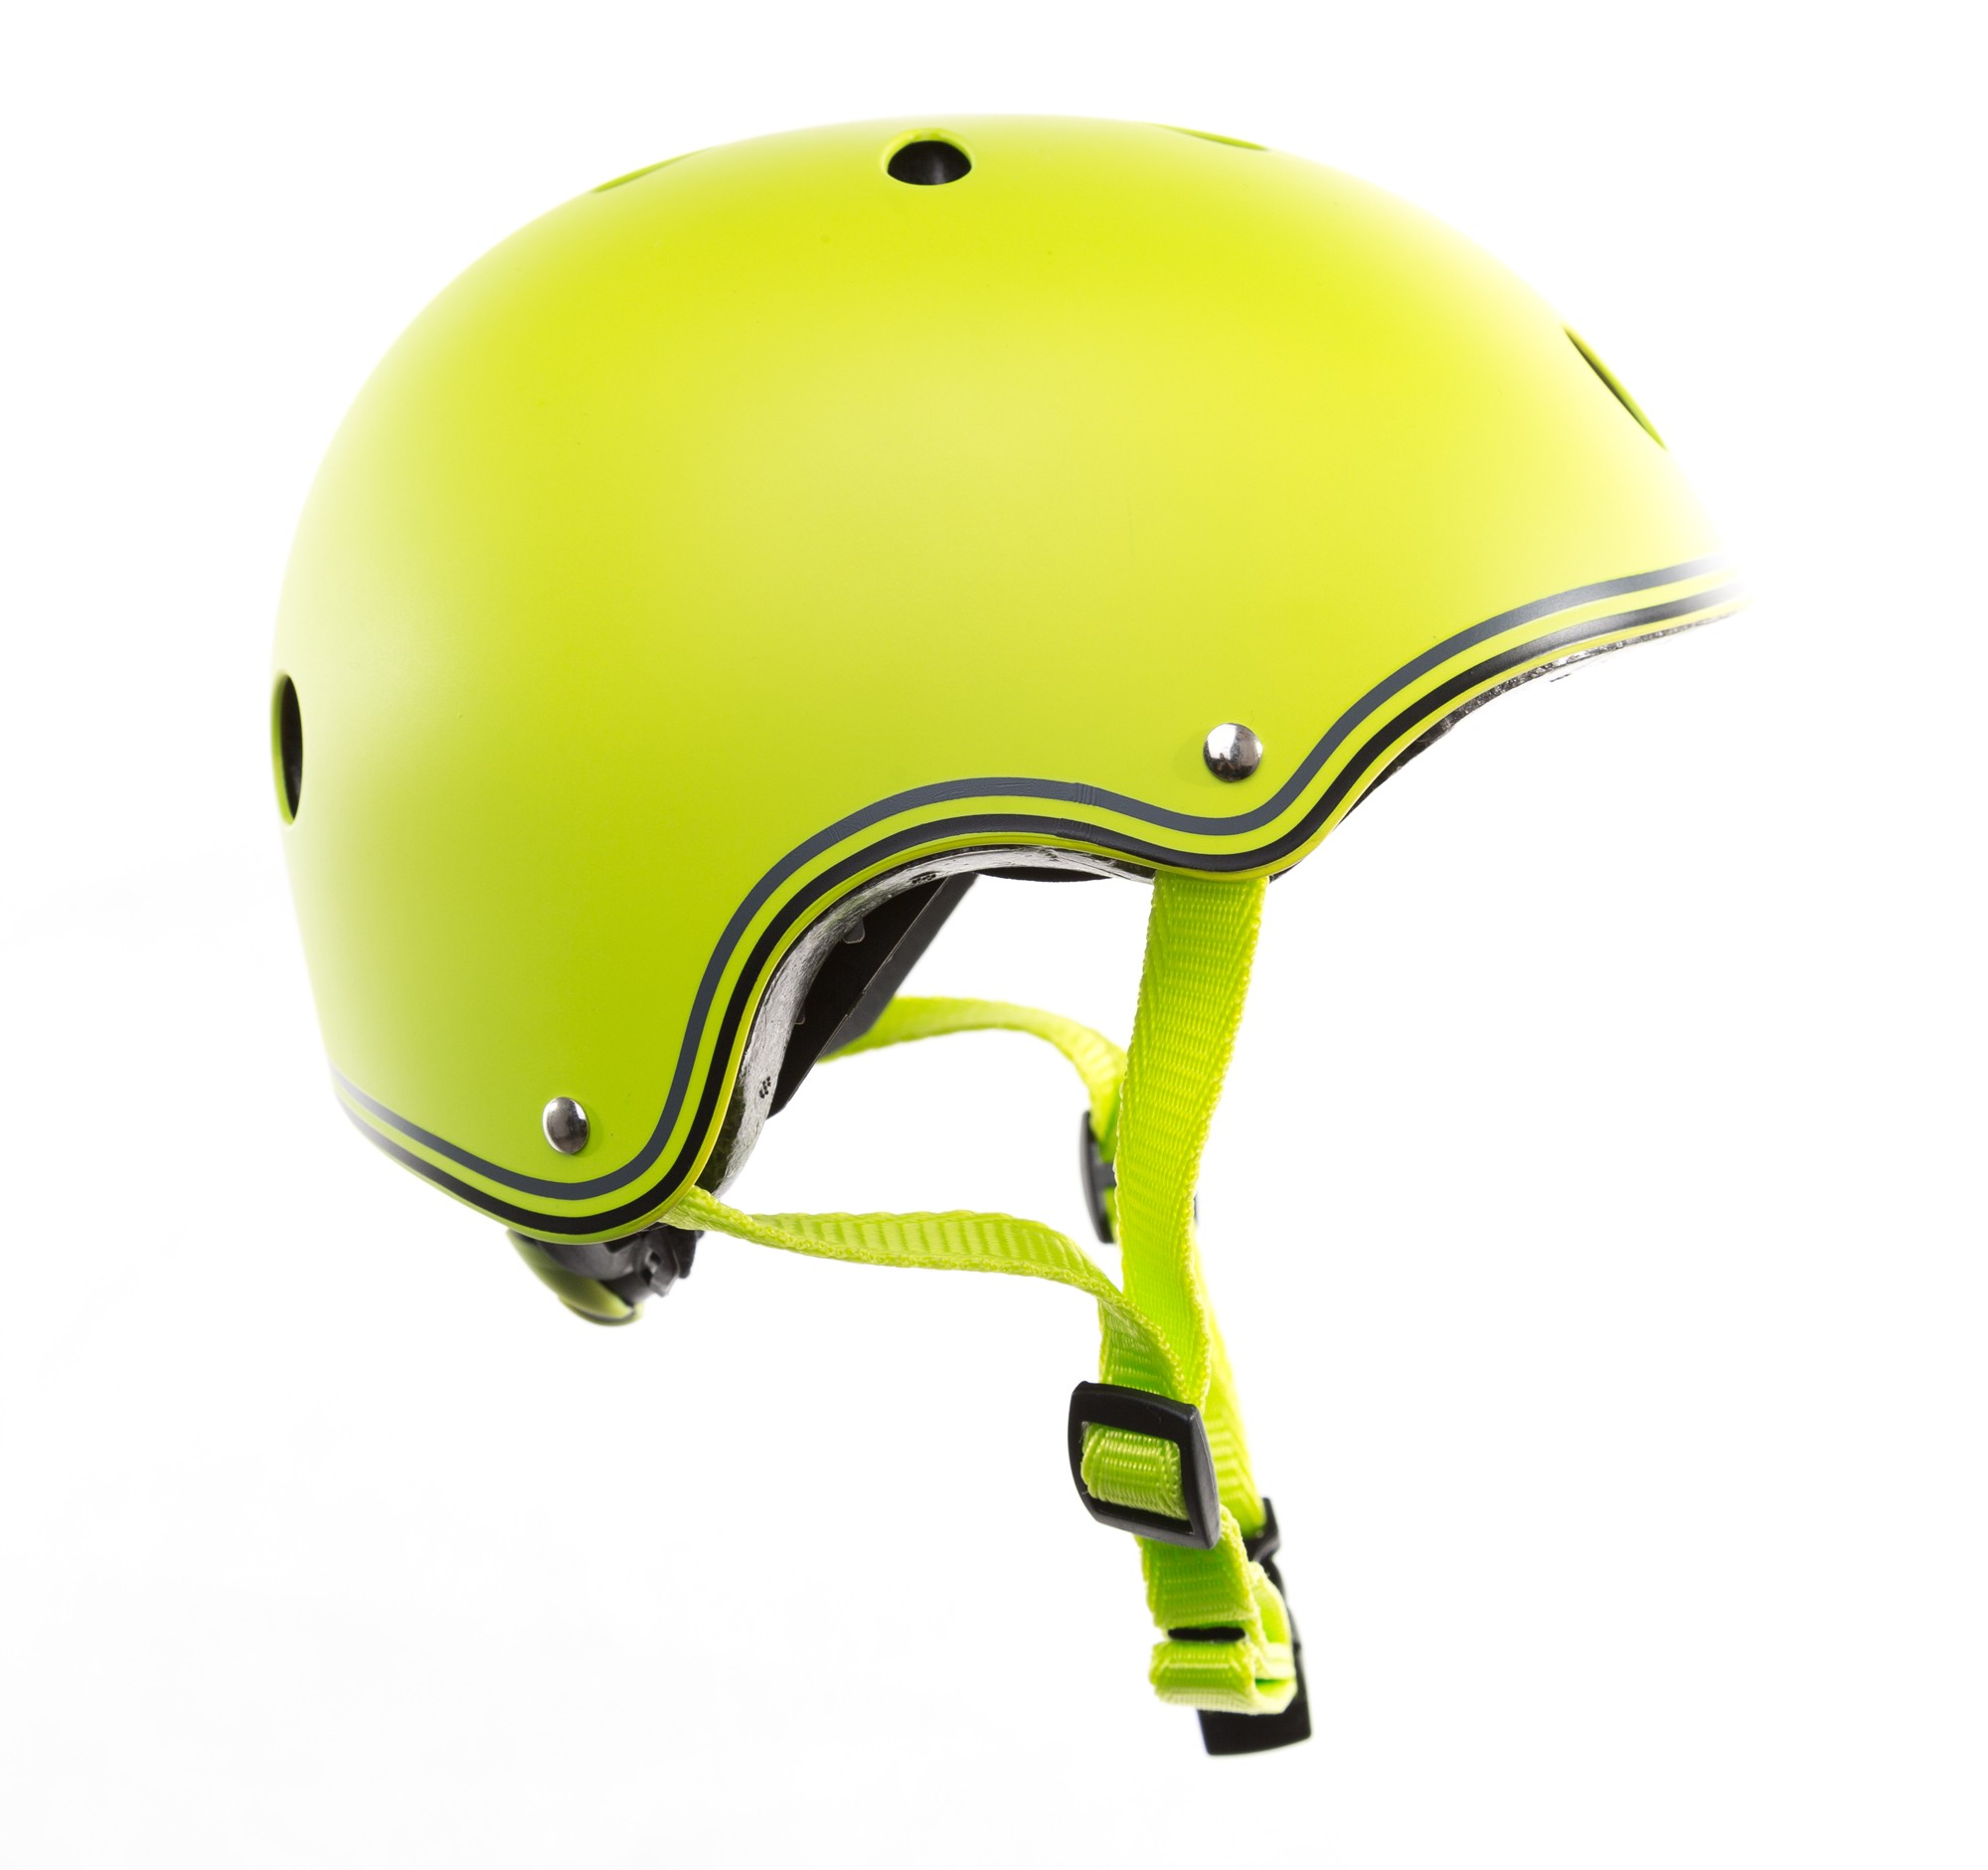 Skateboarder Helm / Skater Helm Globber Junior grün Größe 51-54cm Bild 1